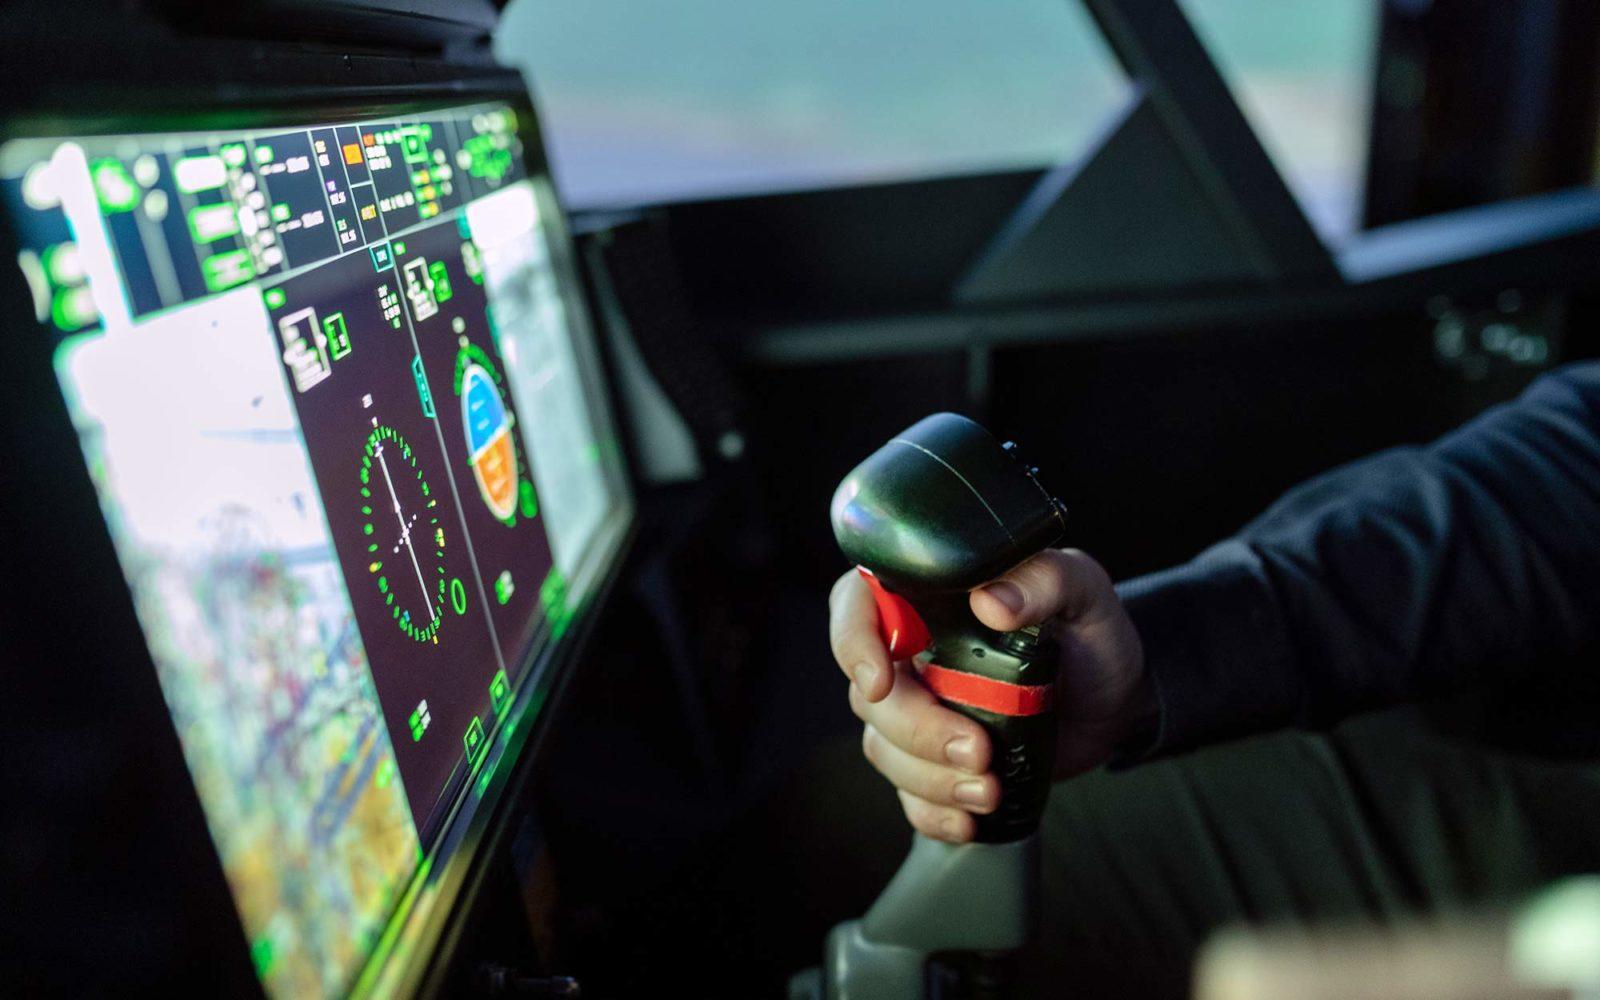 06 Software Update Avionik Plus Avionik Plus Flugfunkservice GmbH